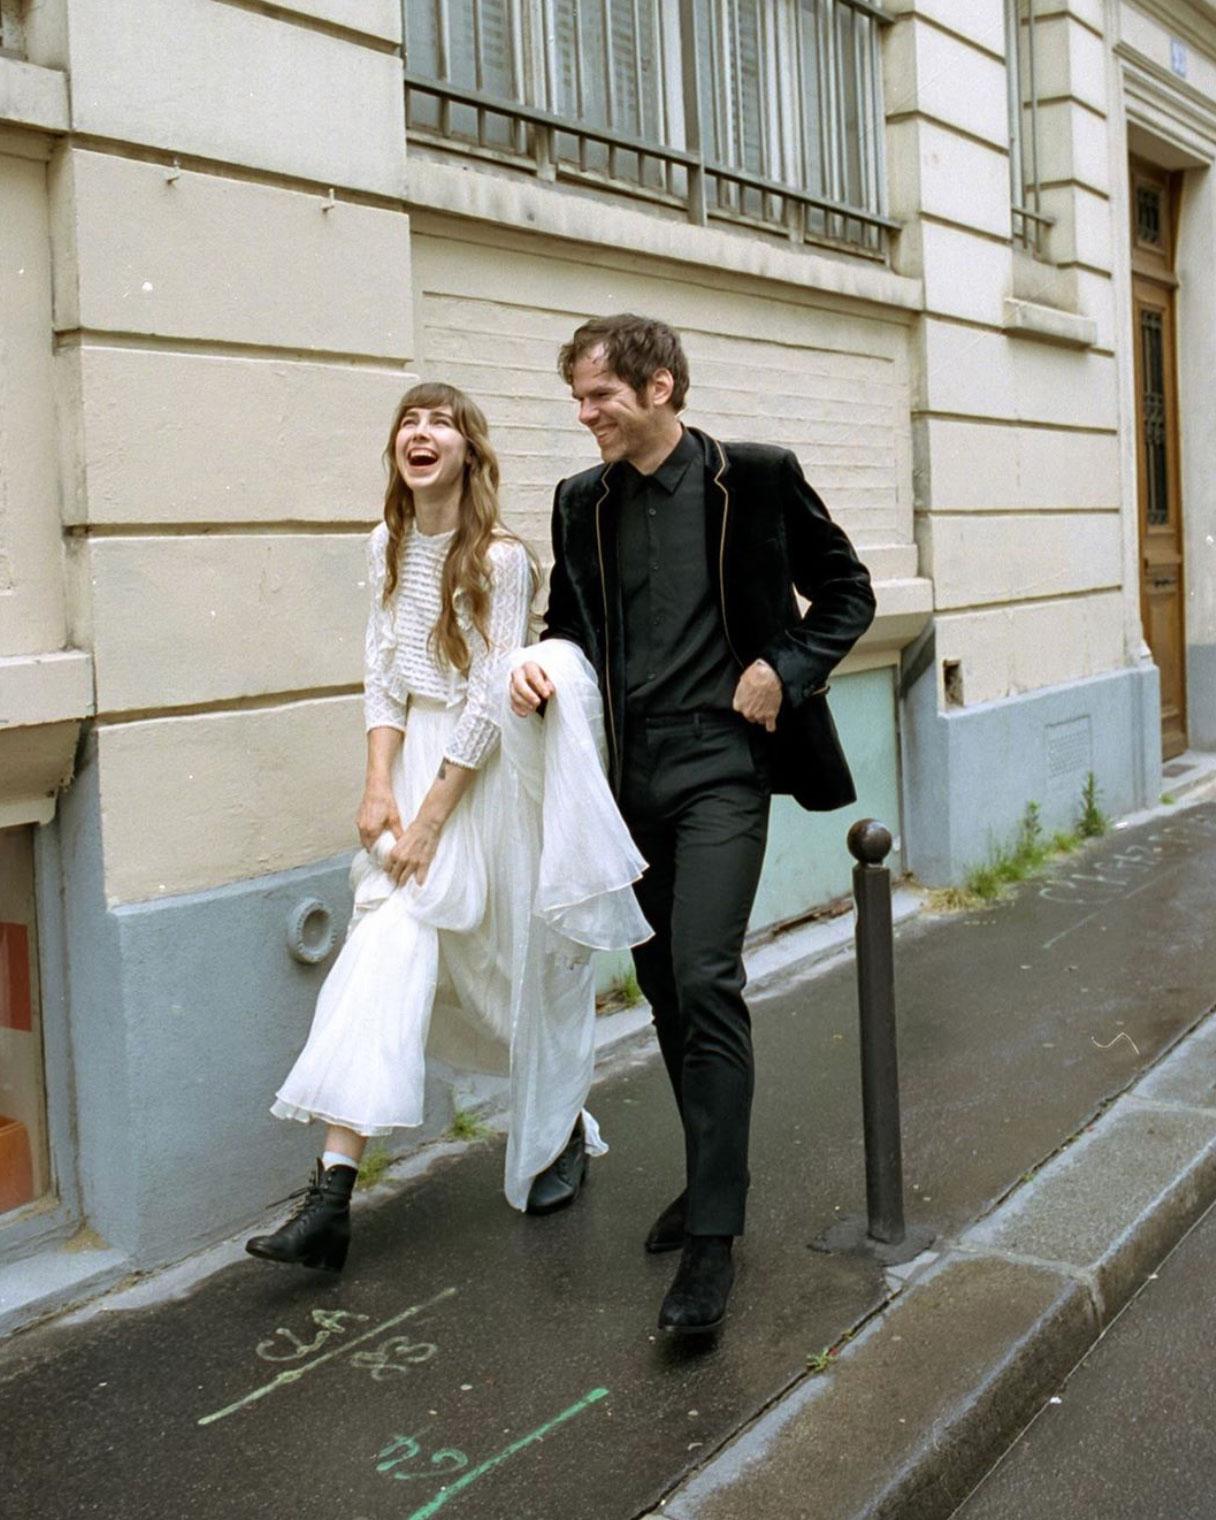 Phil-Chester-Sara-Byrne-Paris-Elopement-01.jpg